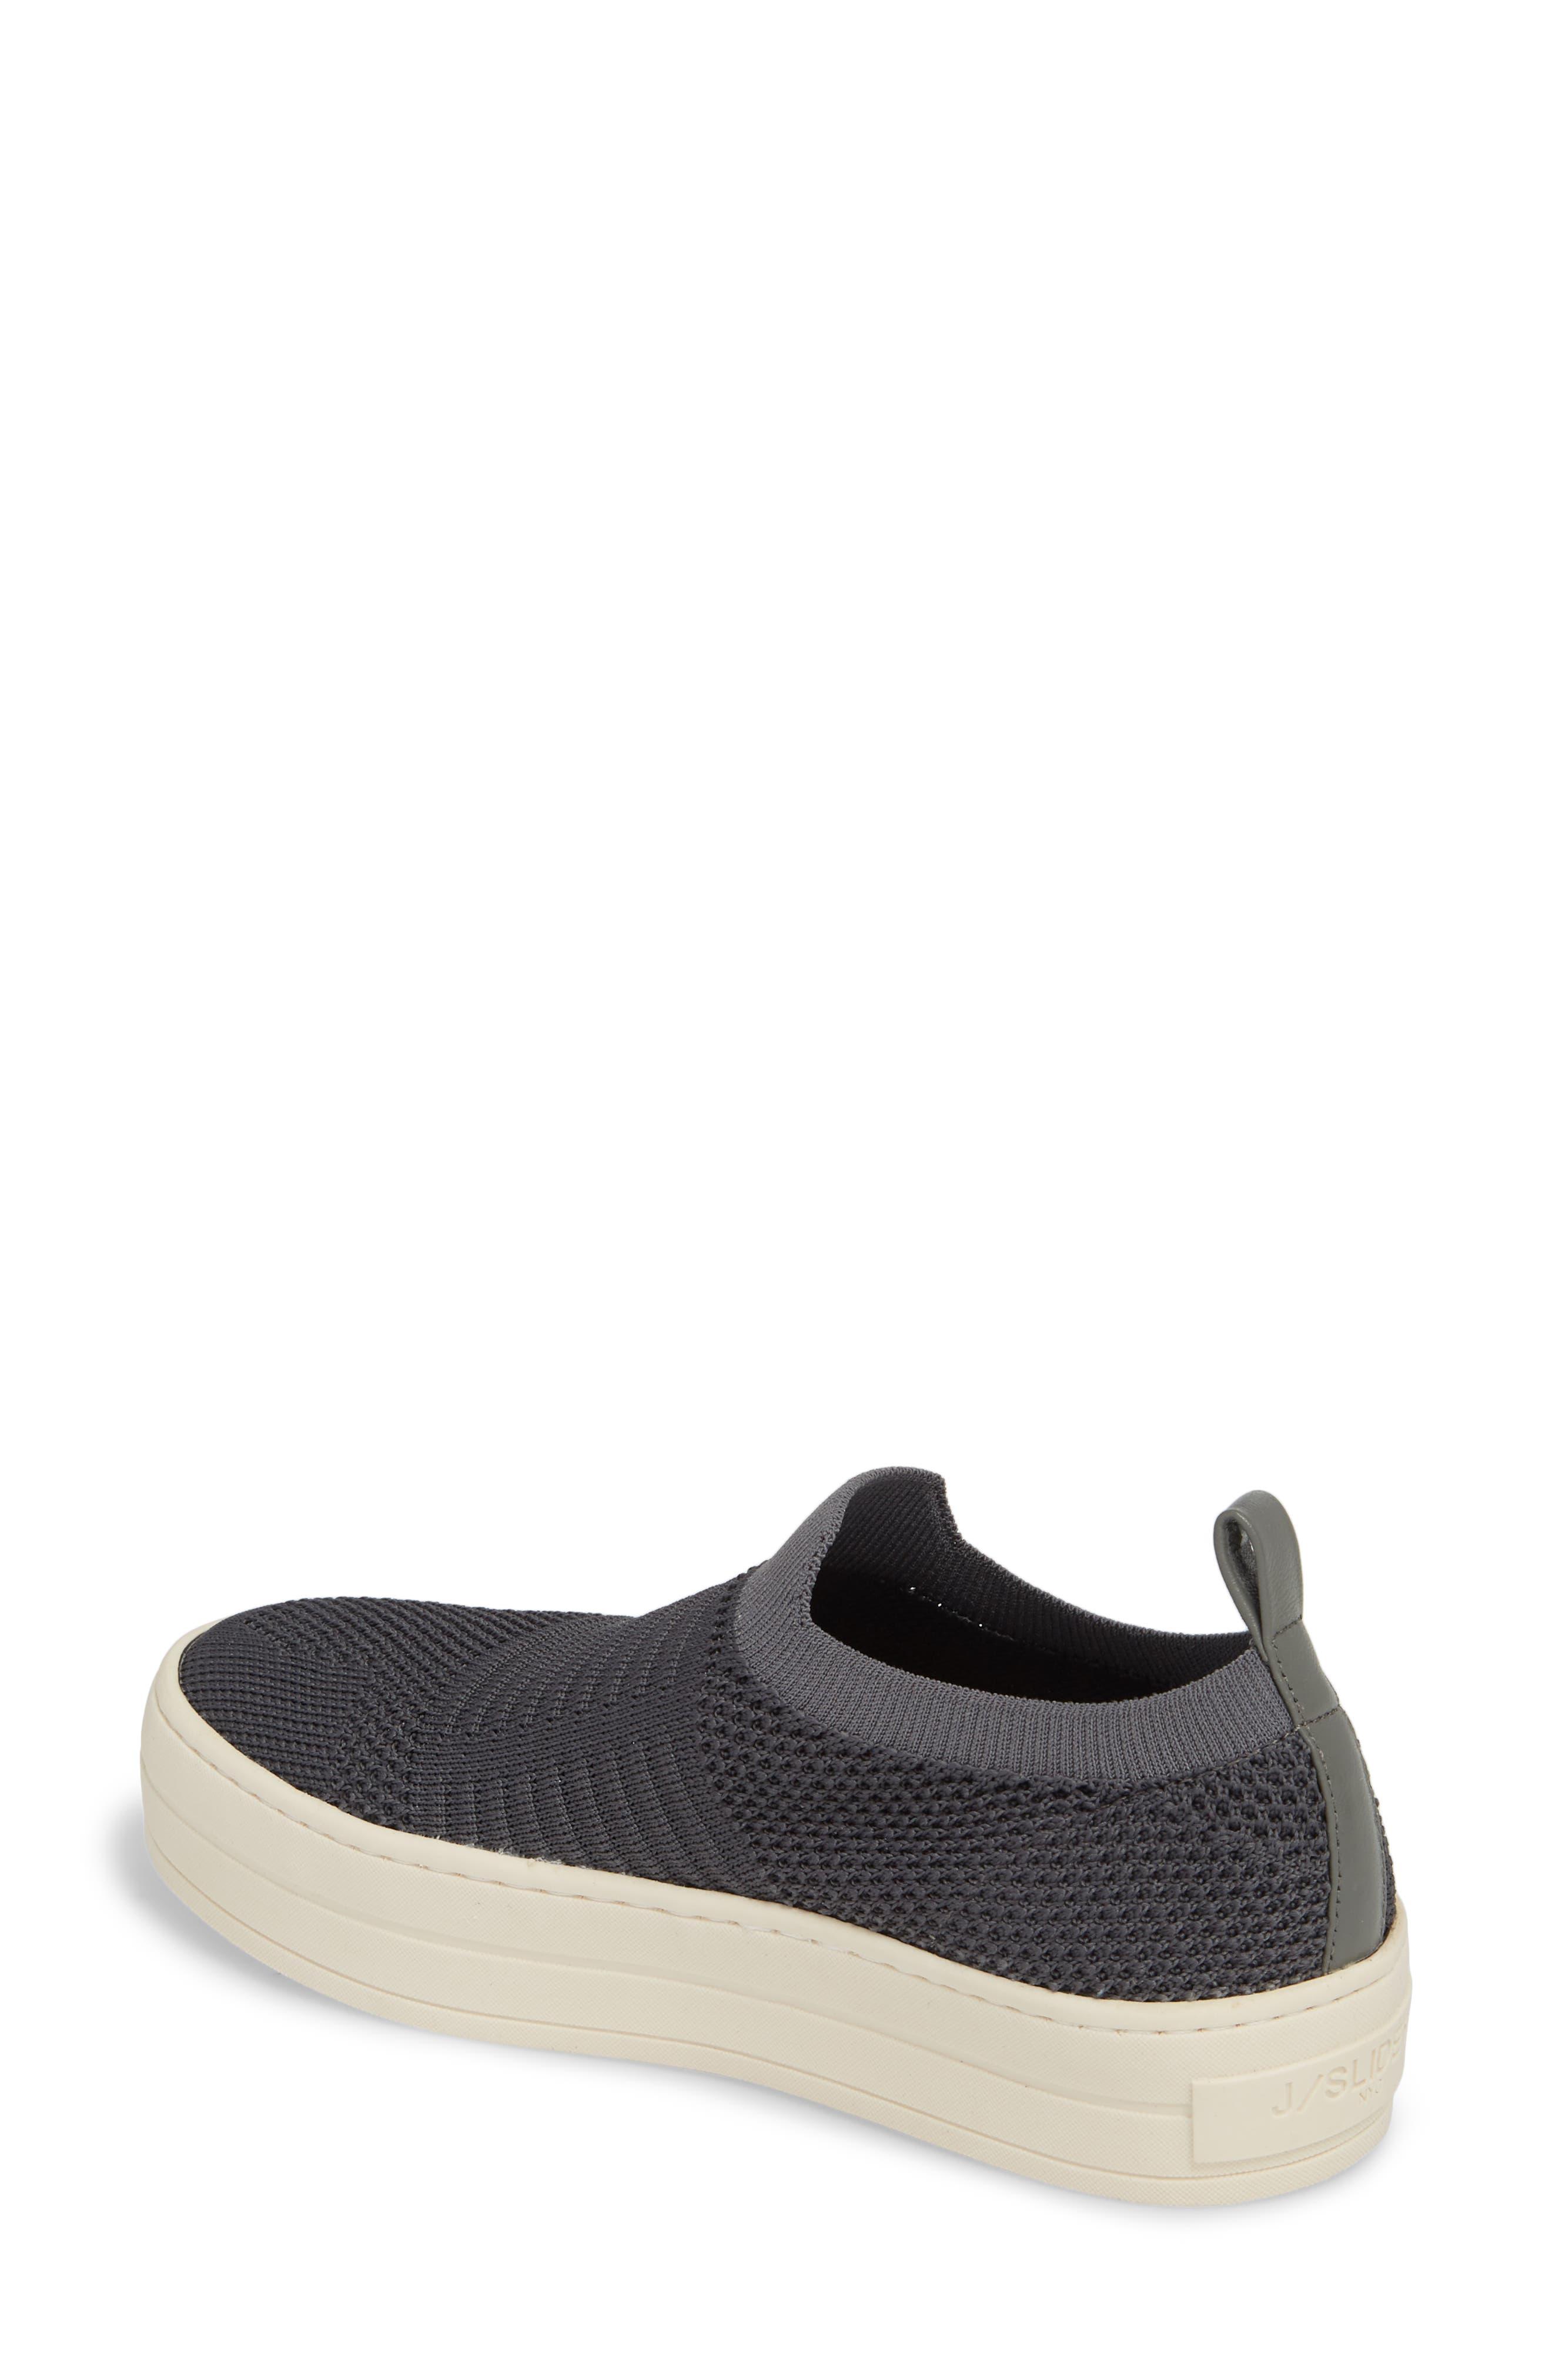 Hilo Platform Slip-On Sneaker,                             Alternate thumbnail 2, color,                             Grey Fabric